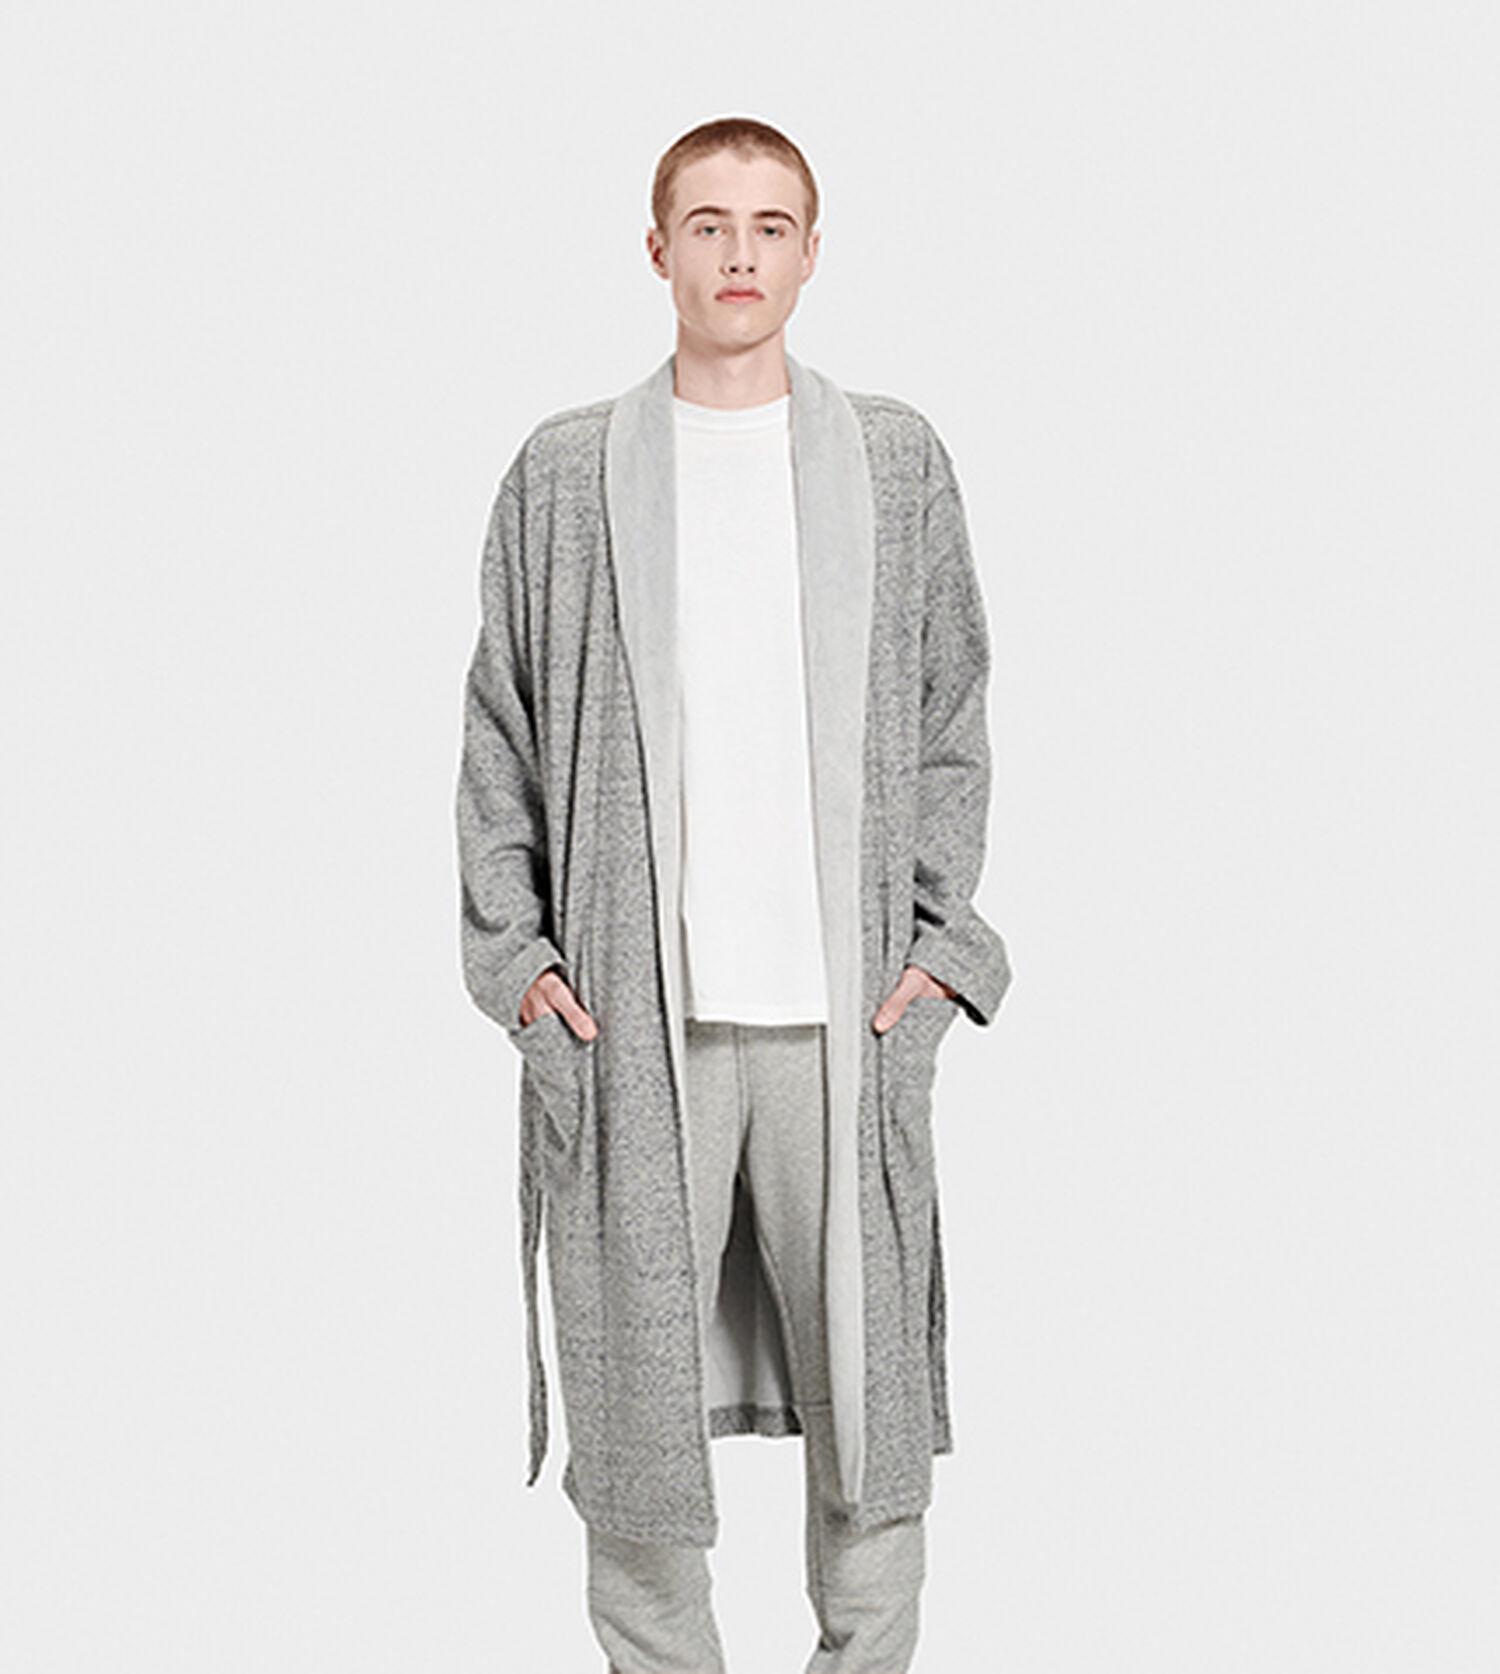 Zoom Robinson Robe - Image 1 of 5 8252b0add